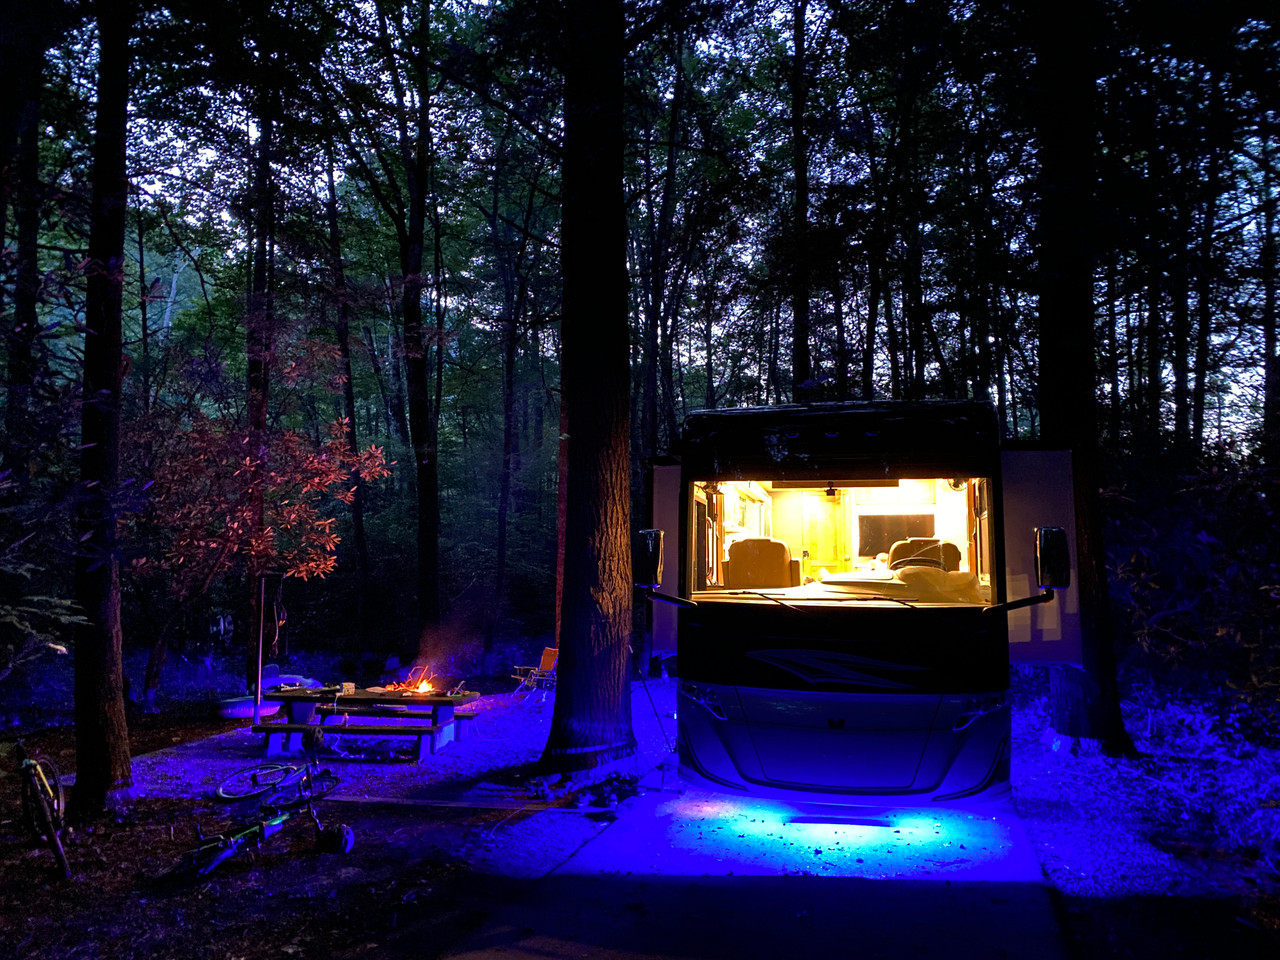 camper underglow